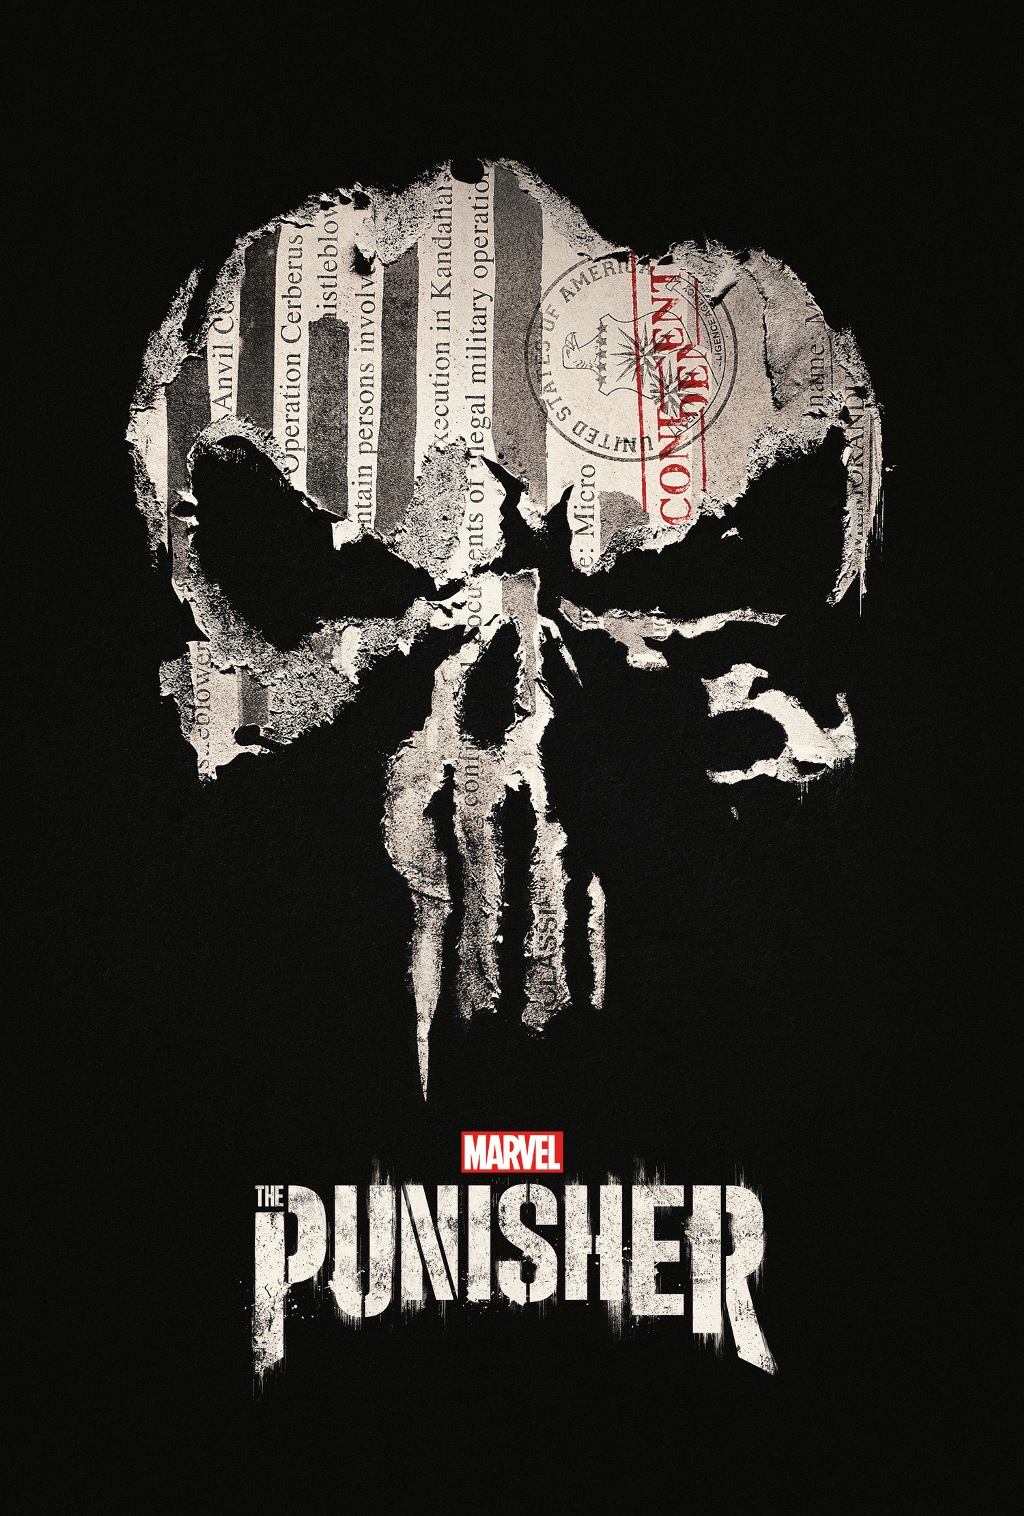 Punisher Netflix Wallpapers Top Free Punisher Netflix